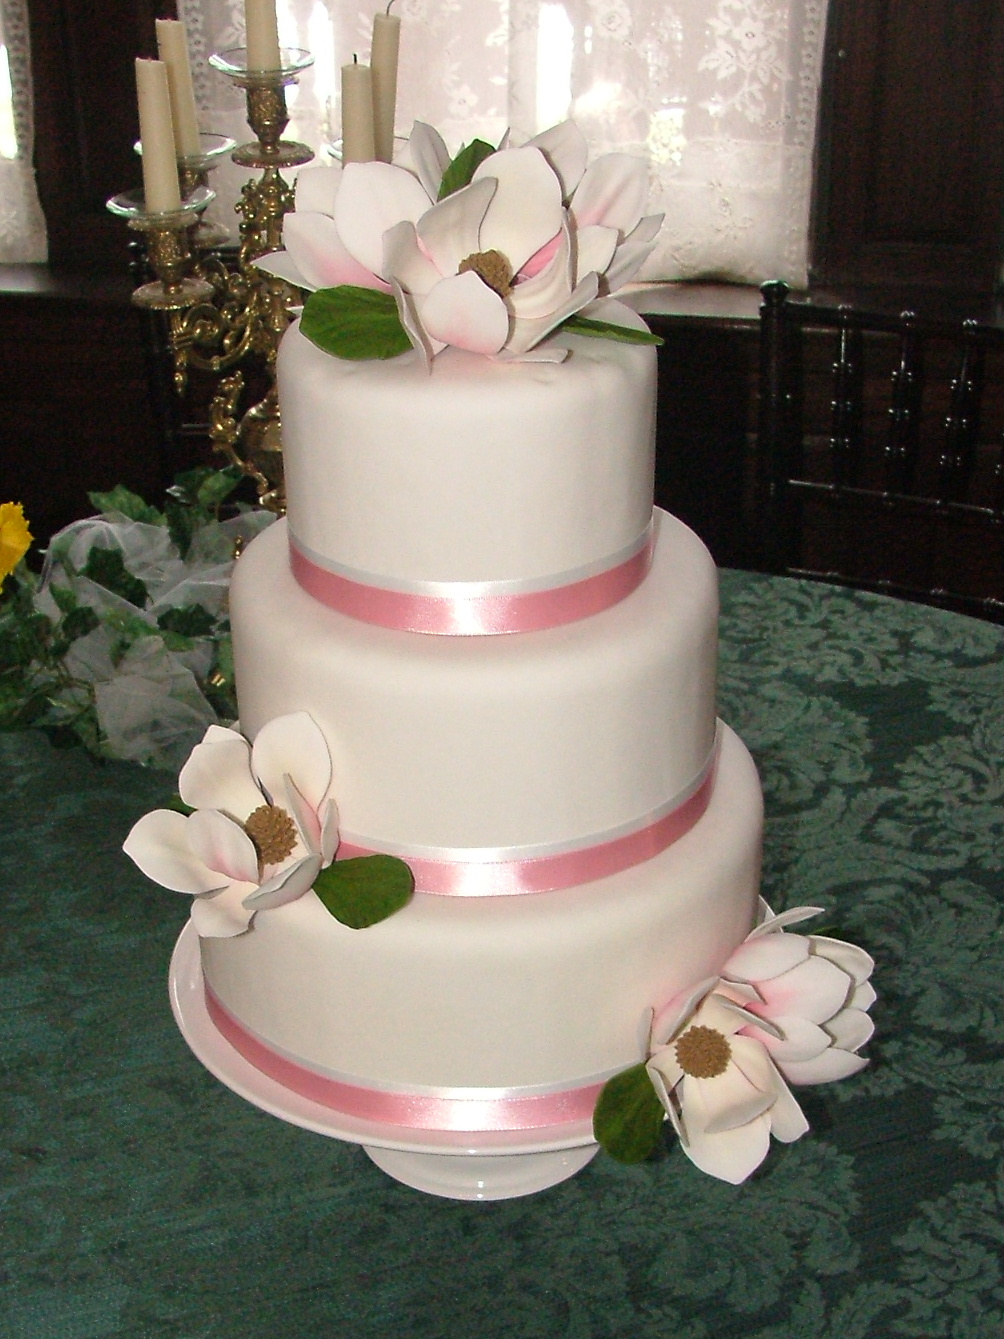 Celebration cakes by catherine bourdon